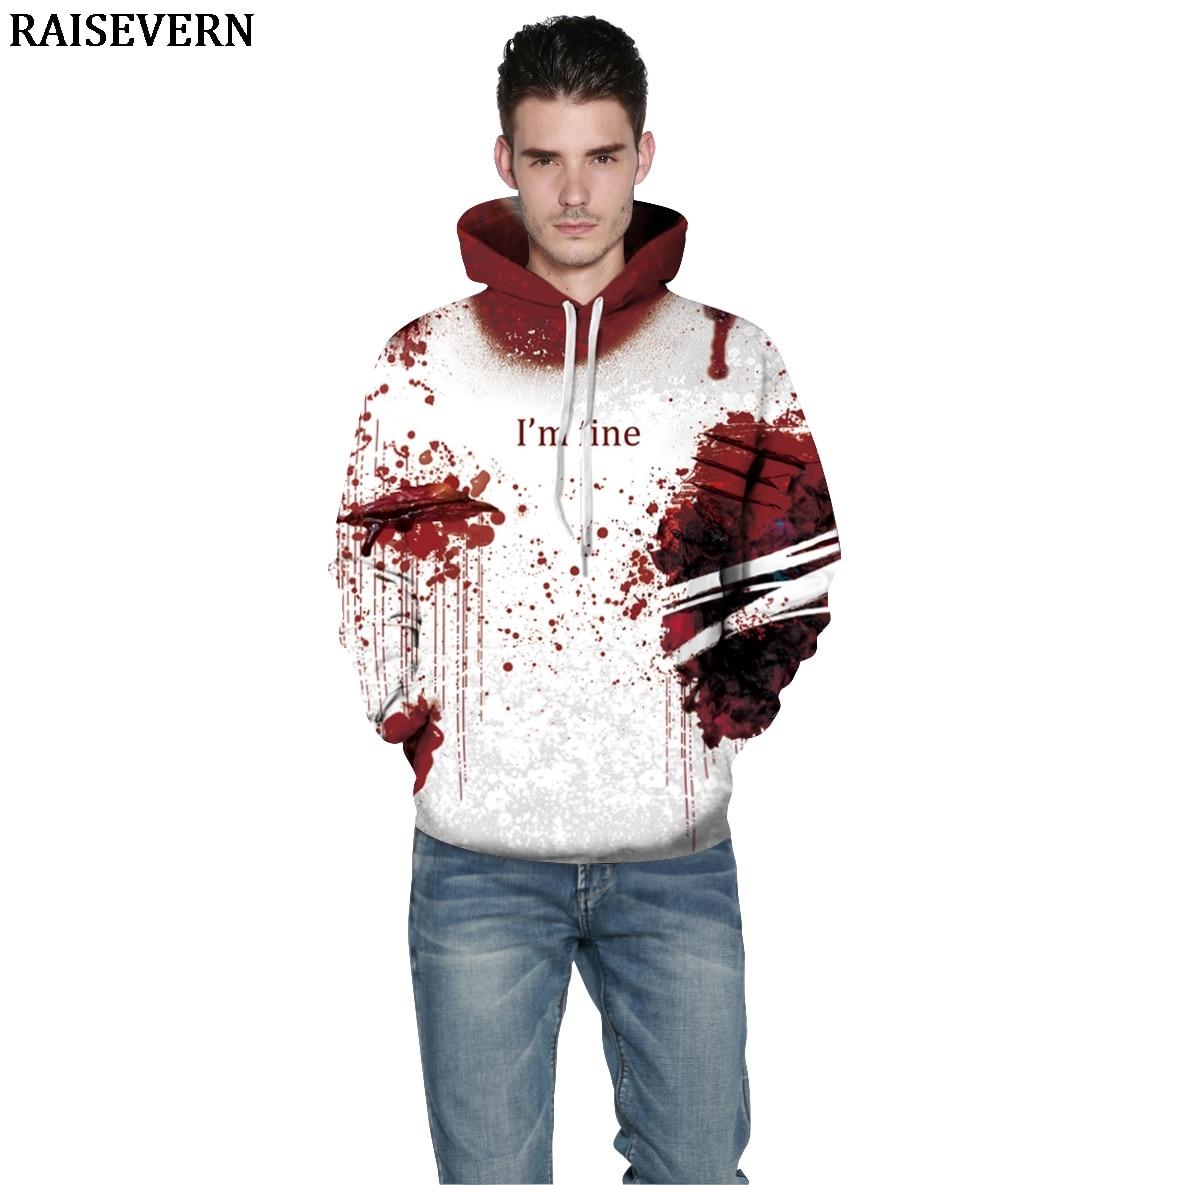 Halloween Blood Hoodies Sweatshirts Women Men I'M FINE Letter Print Jacket Coat Crop Hoodie Jumper Tracksuit Pullover Sweatshirt-in Hoodies & Sweatshirts from Men's Clothing on AliExpress - 11.11_Double 11_Singles' Day 1